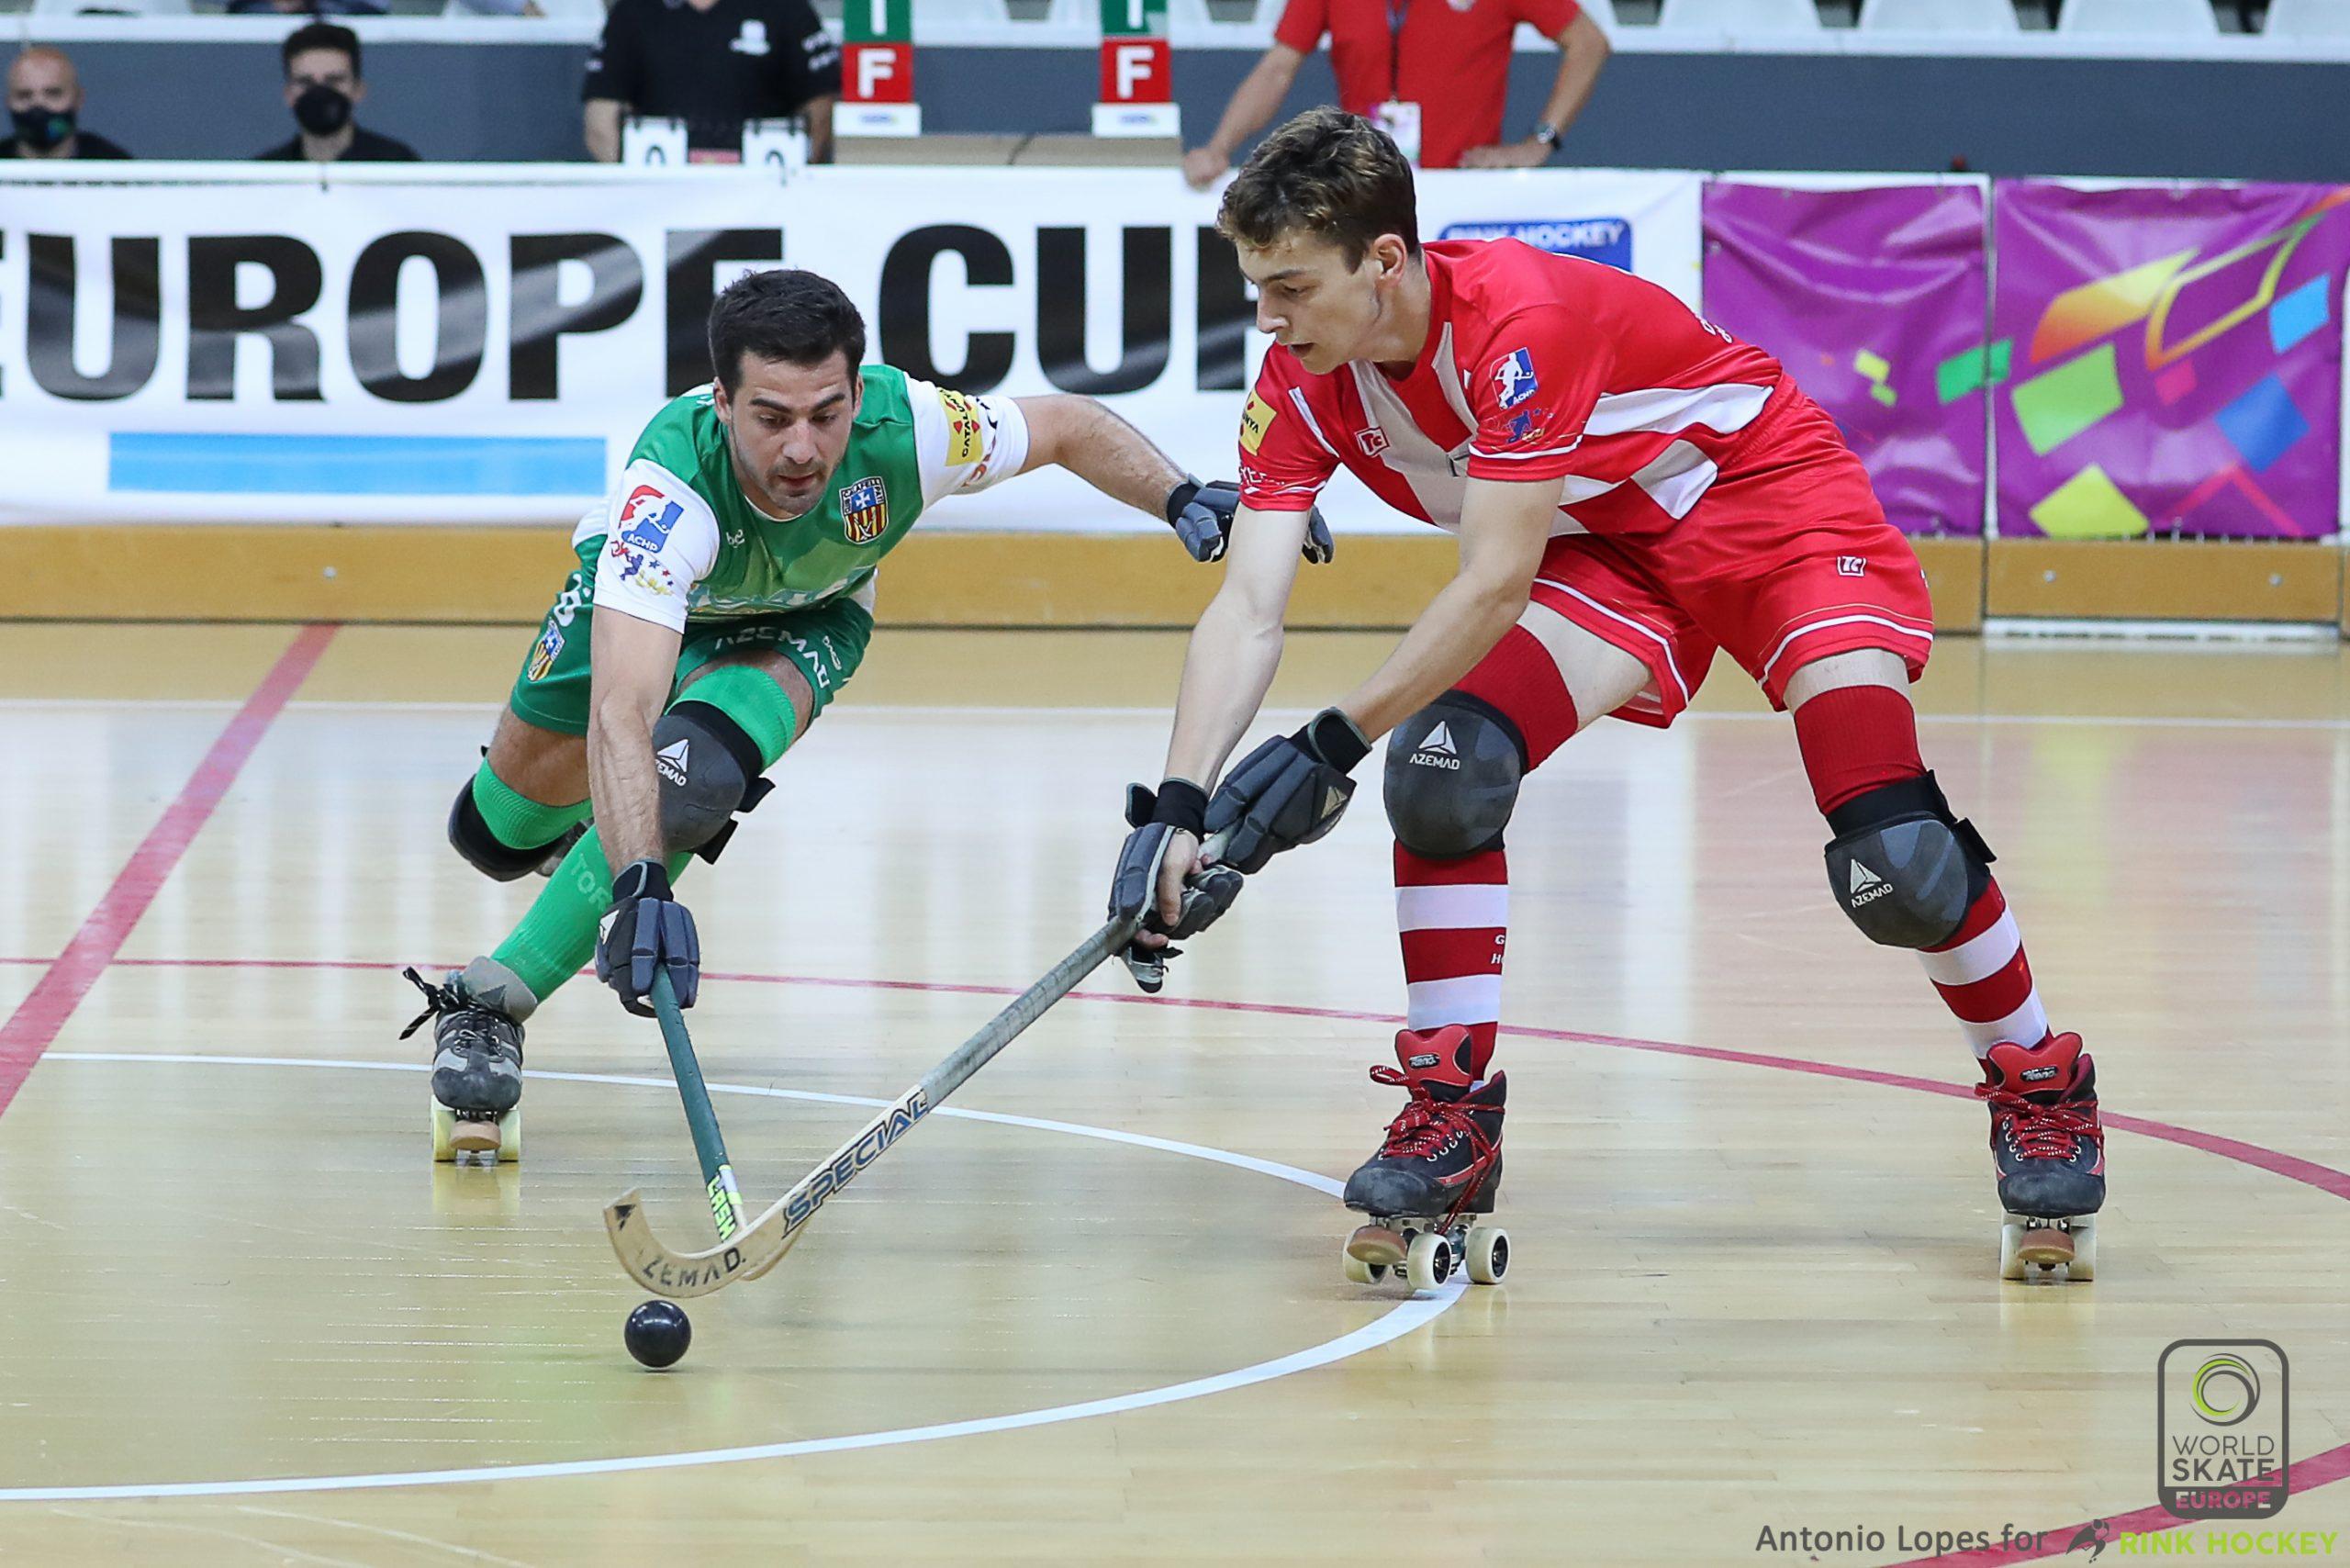 PHOTOS - 18-06-2021 - WS EUROPE CUP - Match #020 - CP Calafell Tot l'Any (SP) x Garatge Plana Girona CH (SP)